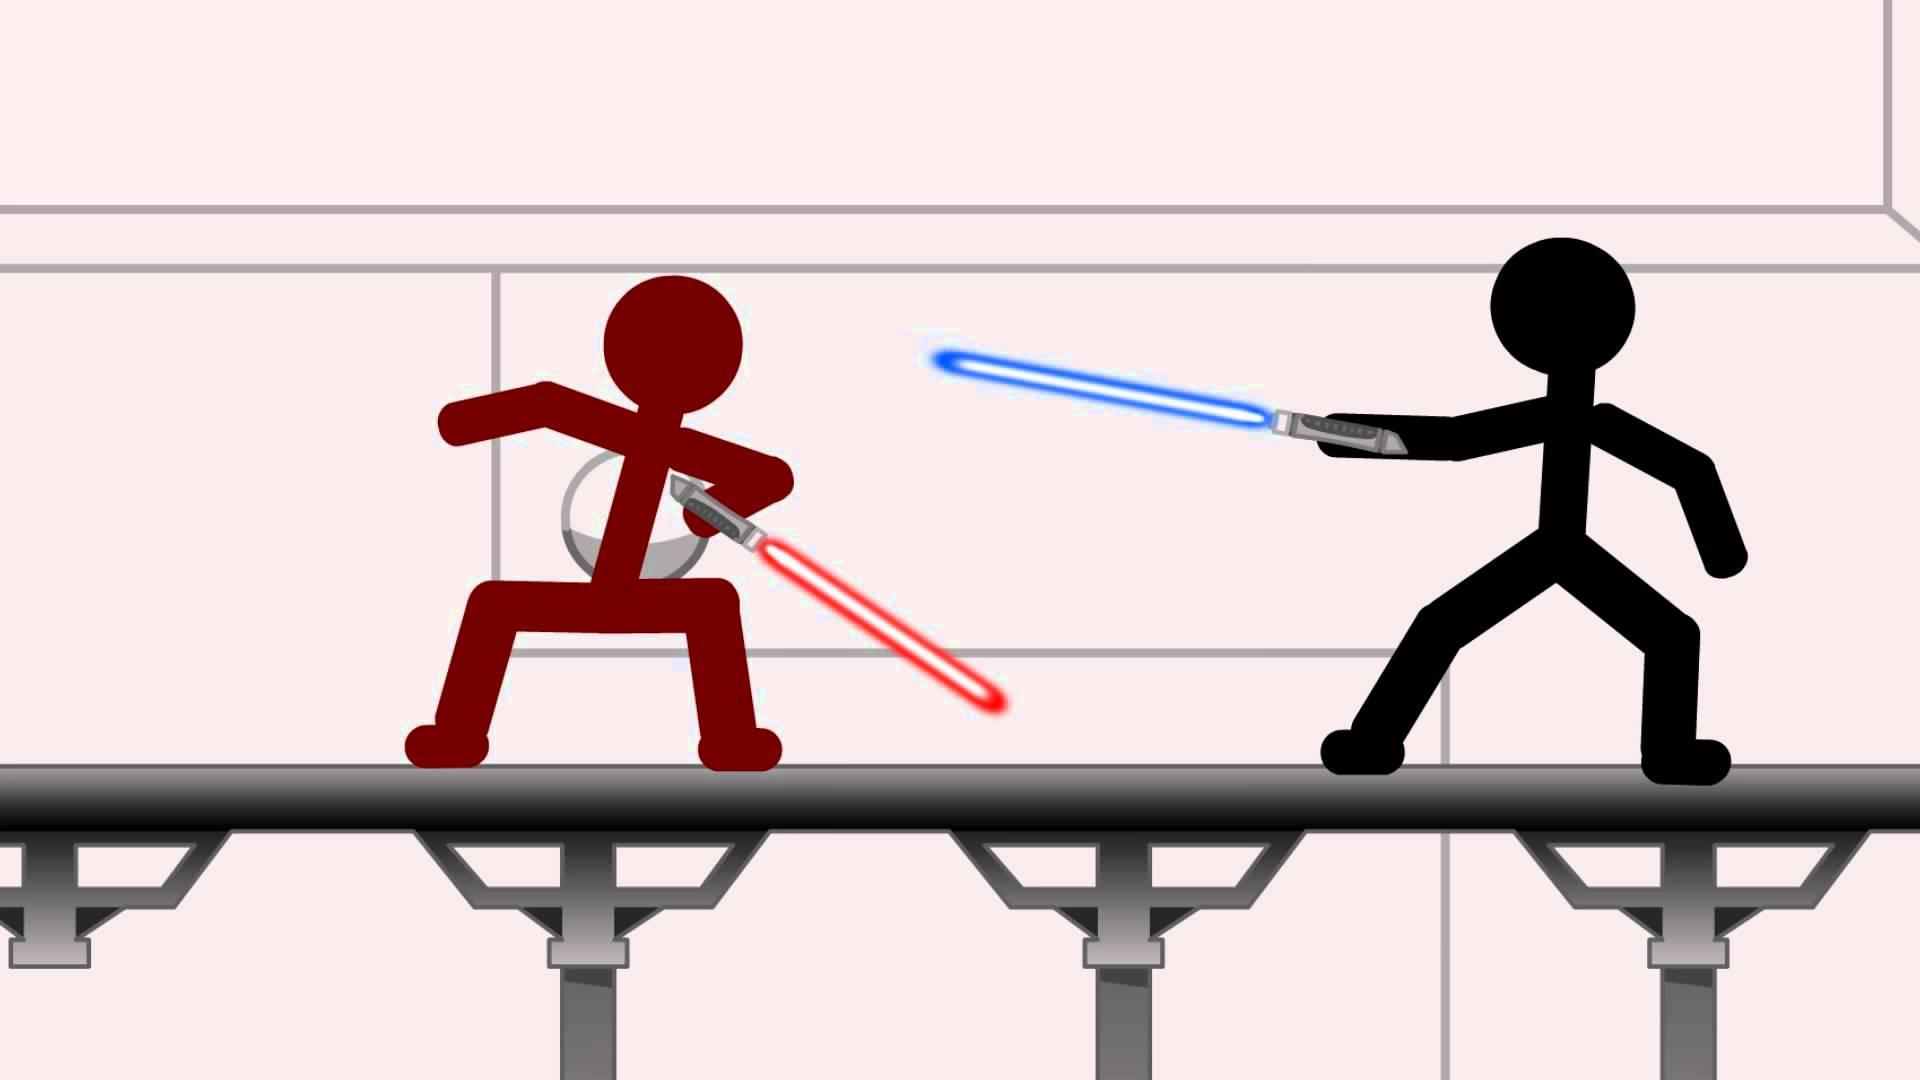 1920x1080 Star Wars Stick Figure Battle!